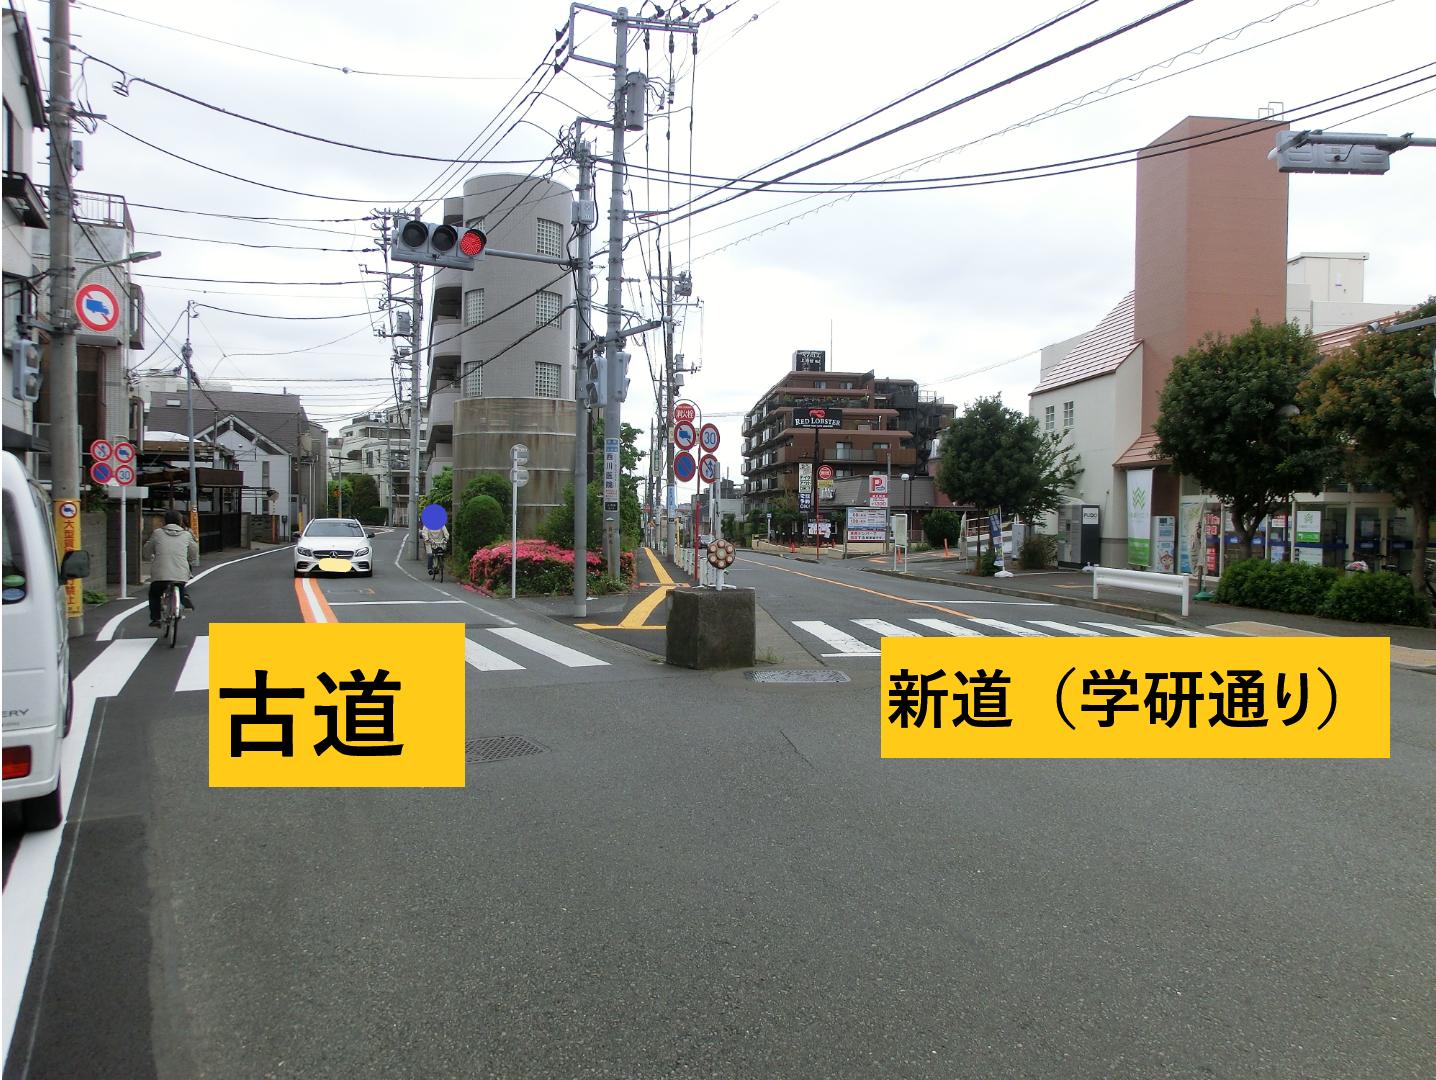 古道と新道の二又道 上池台1